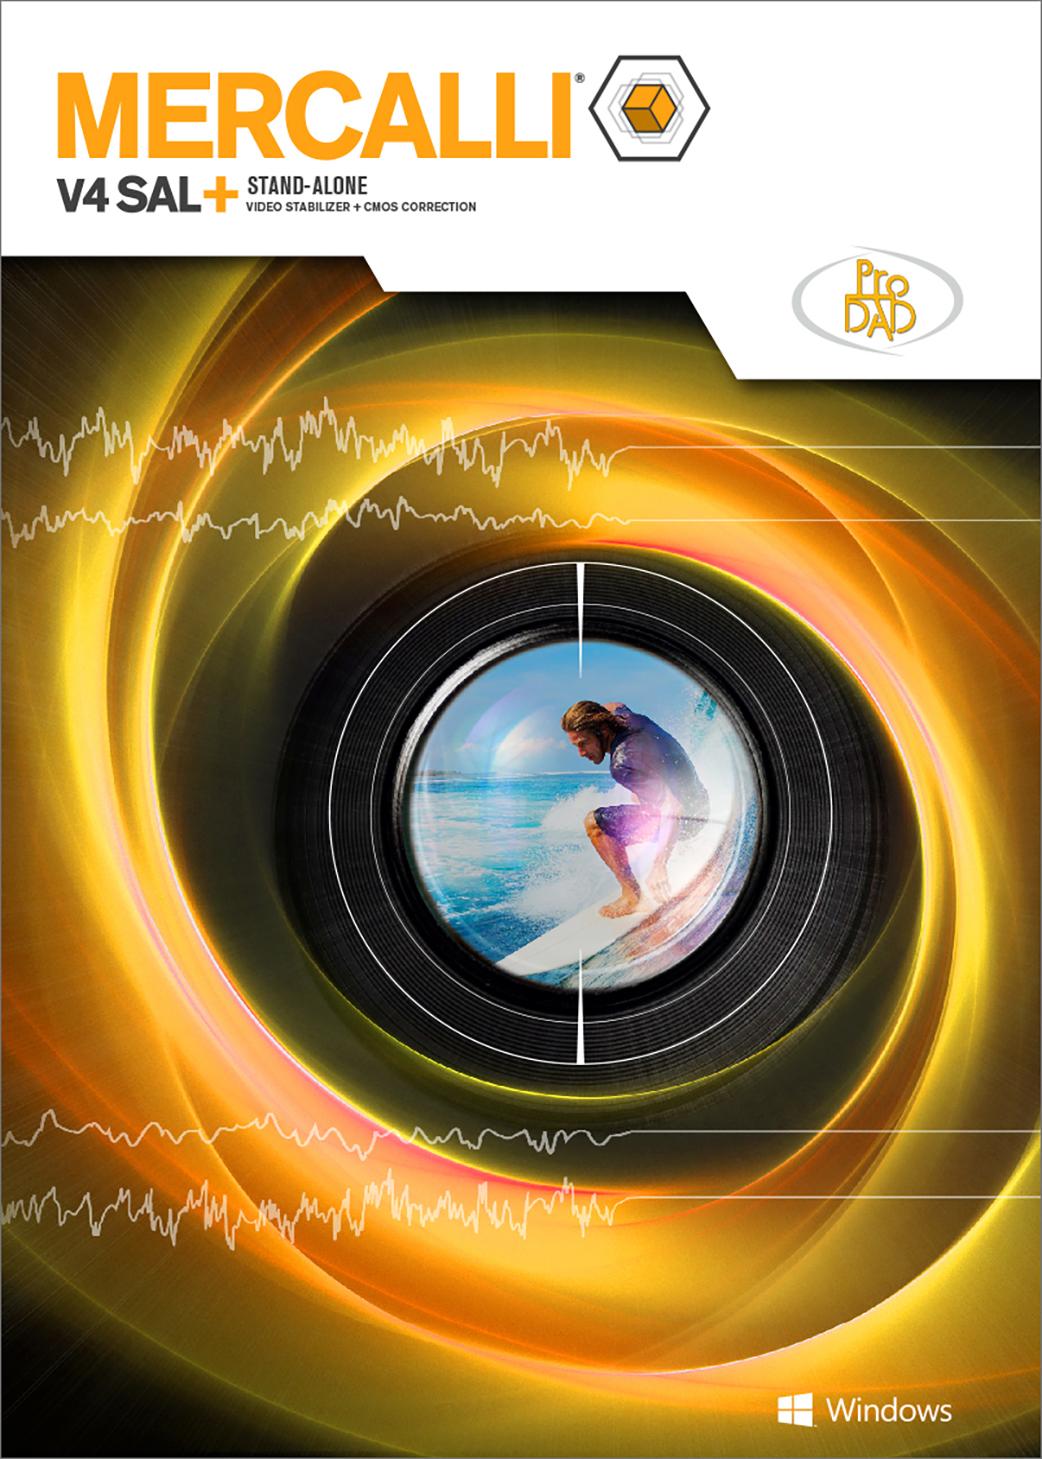 mercalli-v4-sal-full-version-64-bit-video-stabilizer-dynamic-cmos-distortion-correction-software-dow